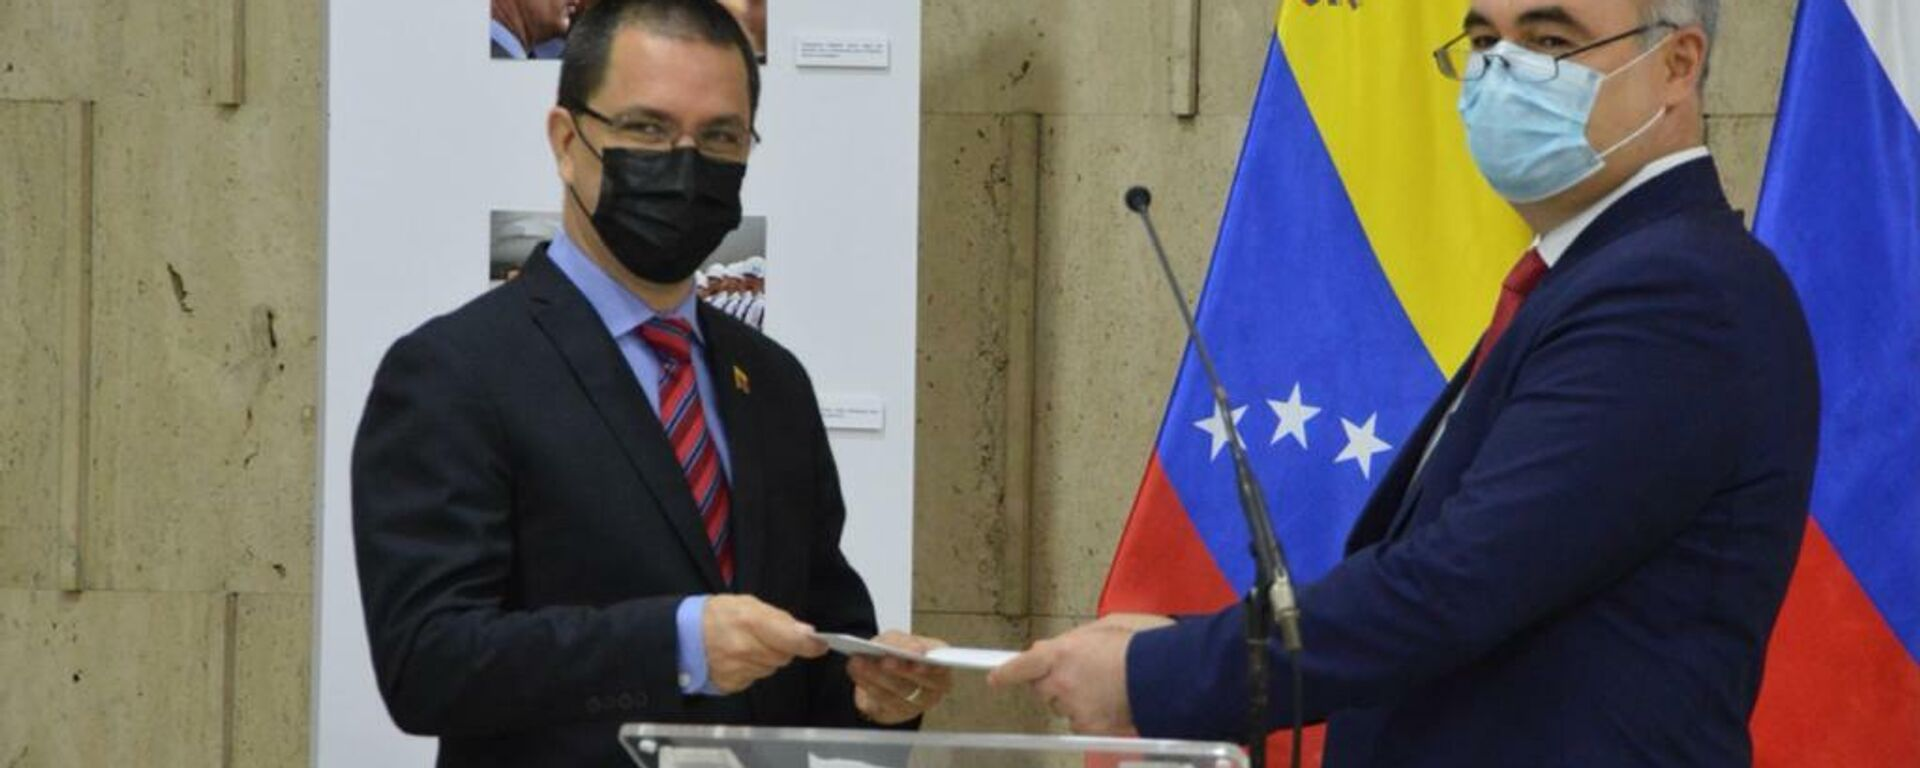 El canciller venezolano, Jorge Arreaza (izda.), con el embajador de Rusia en Venezuela, Serguéi Melik-Bagdasárov (dcha.) - Sputnik Mundo, 1920, 24.05.2021